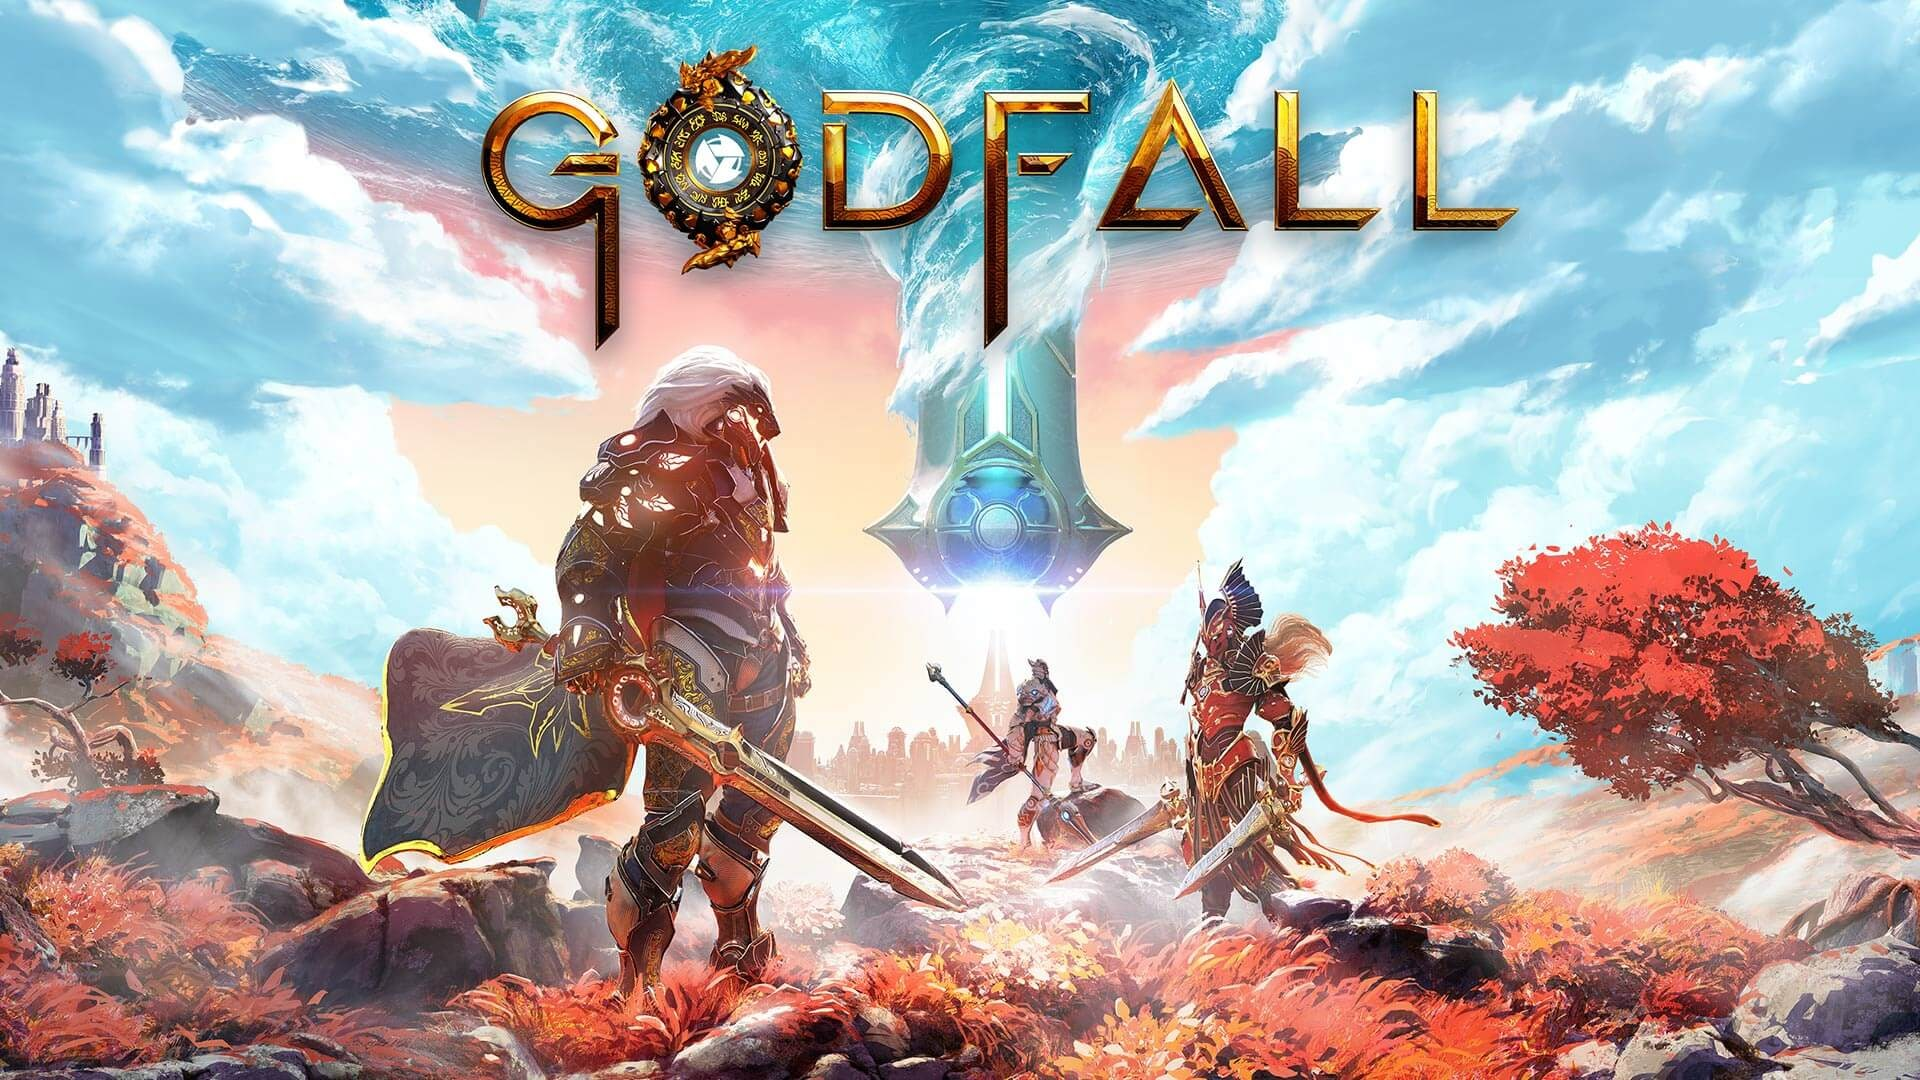 Diesel productv2 godfall home EGS Godfall CounterplayGames G1A 00 1920x1080 b7f98a1d6581af9100a03b17f77420de408c1b96